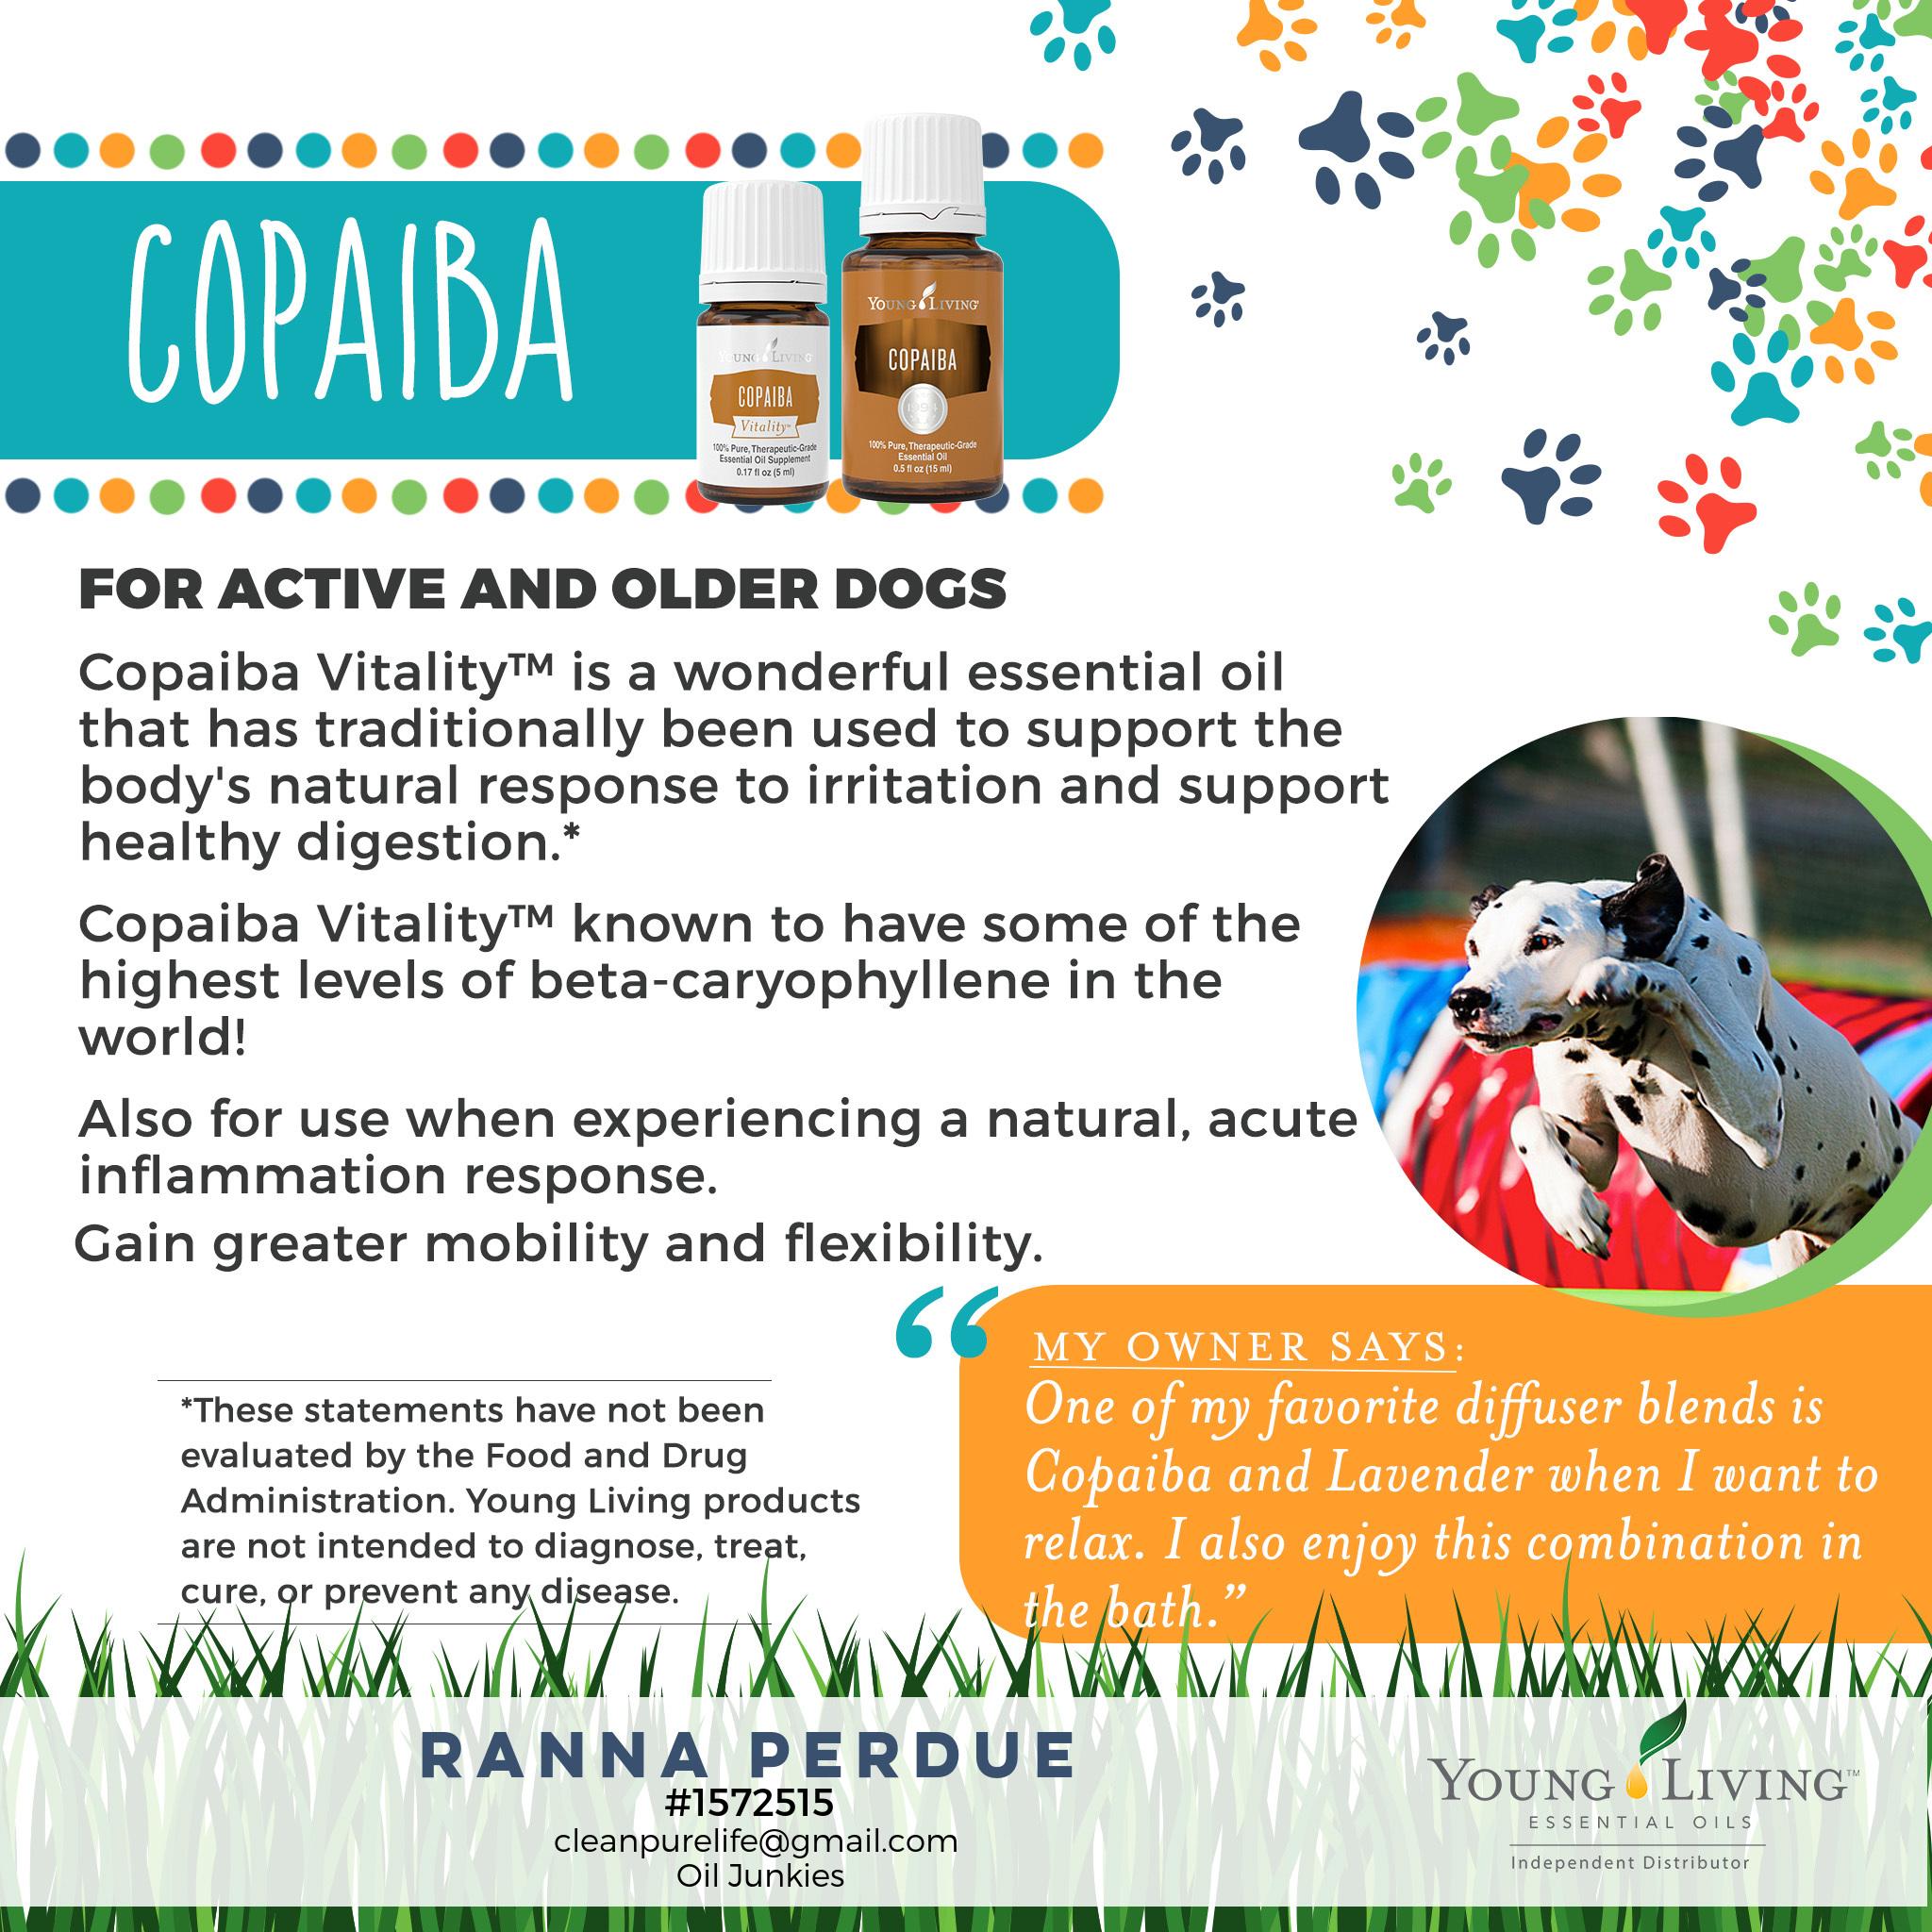 9-Dogs-Copaiba-1